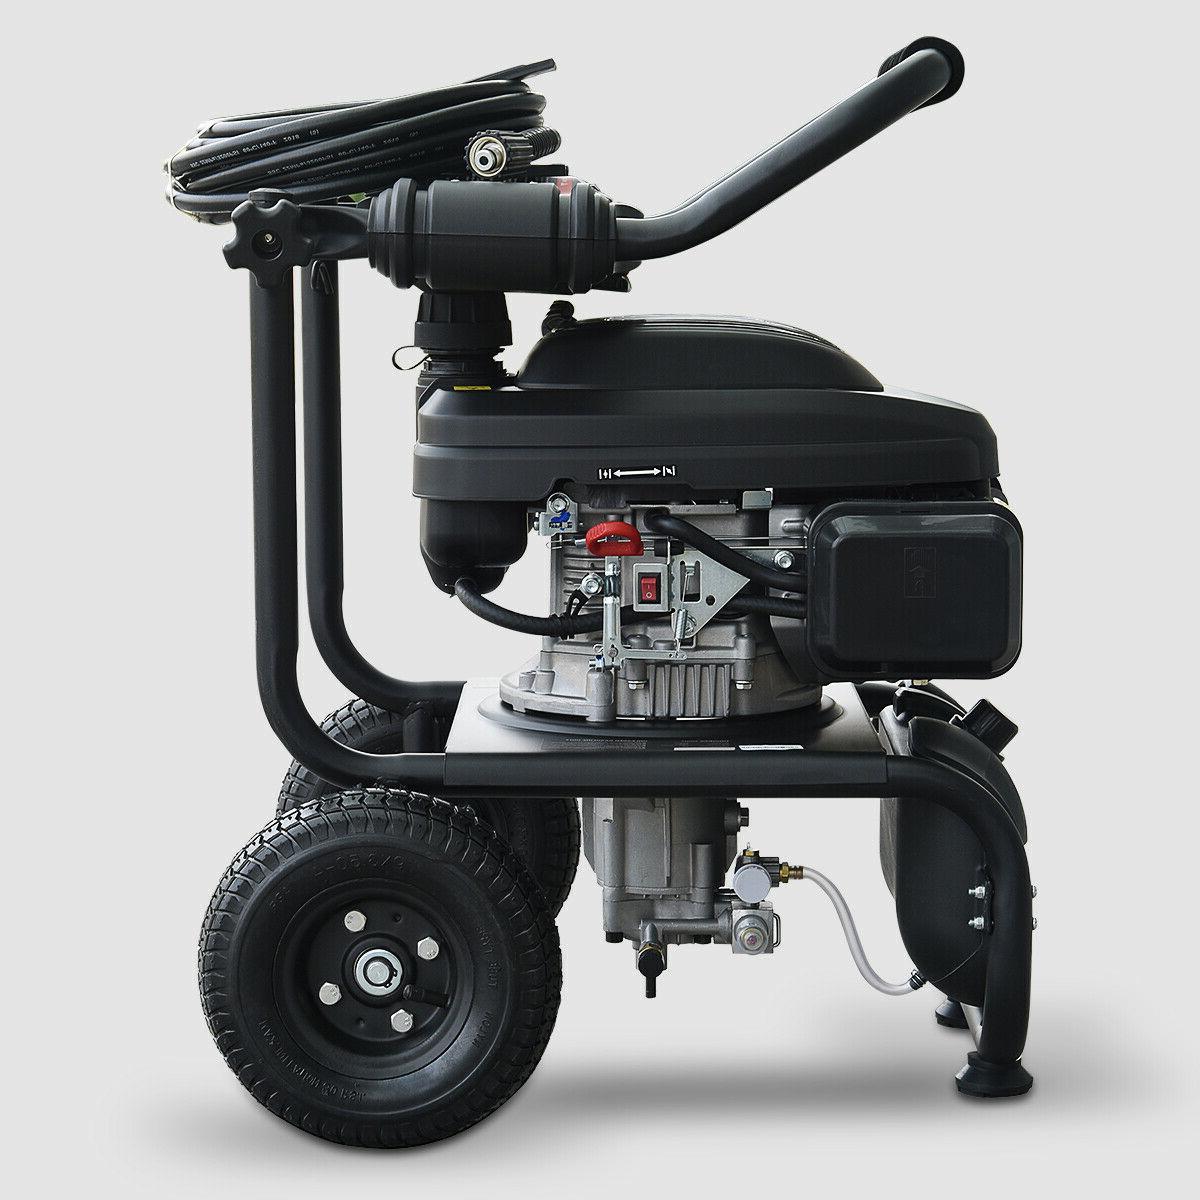 HUMBEE WG-3200 3,200 Psi Gas Black, CARB